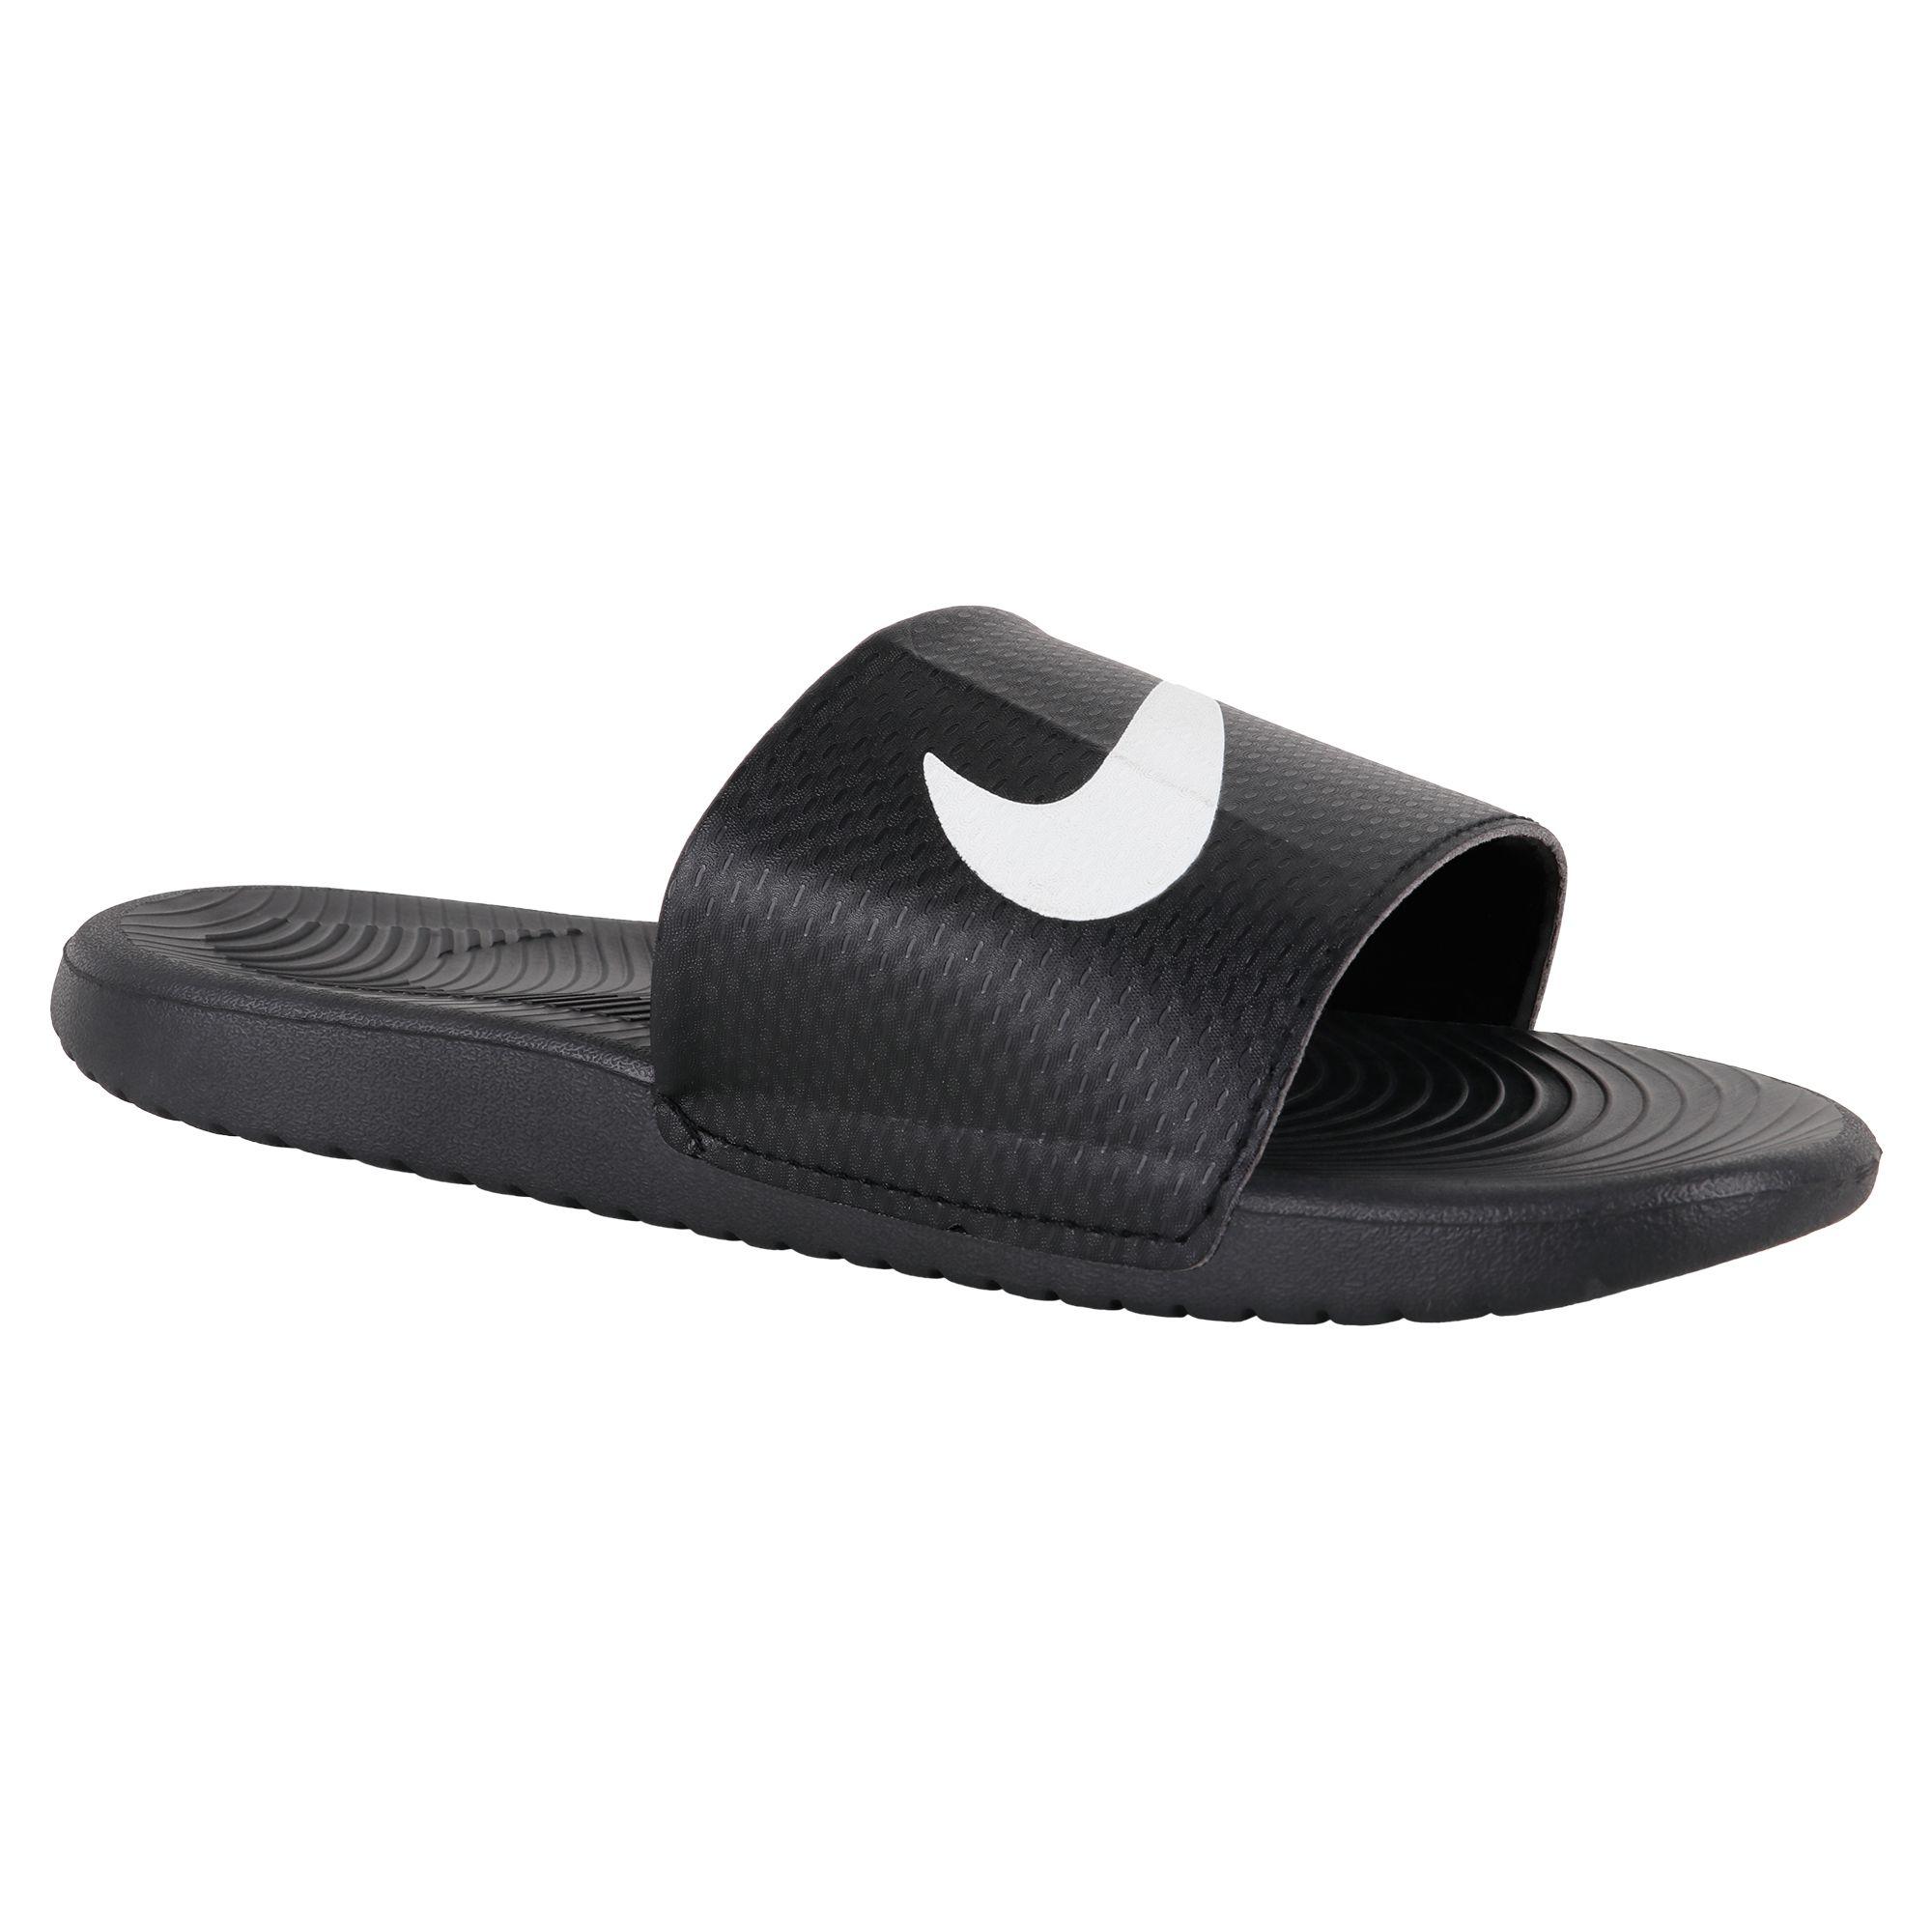 Nike Black Daily Slippers Price in